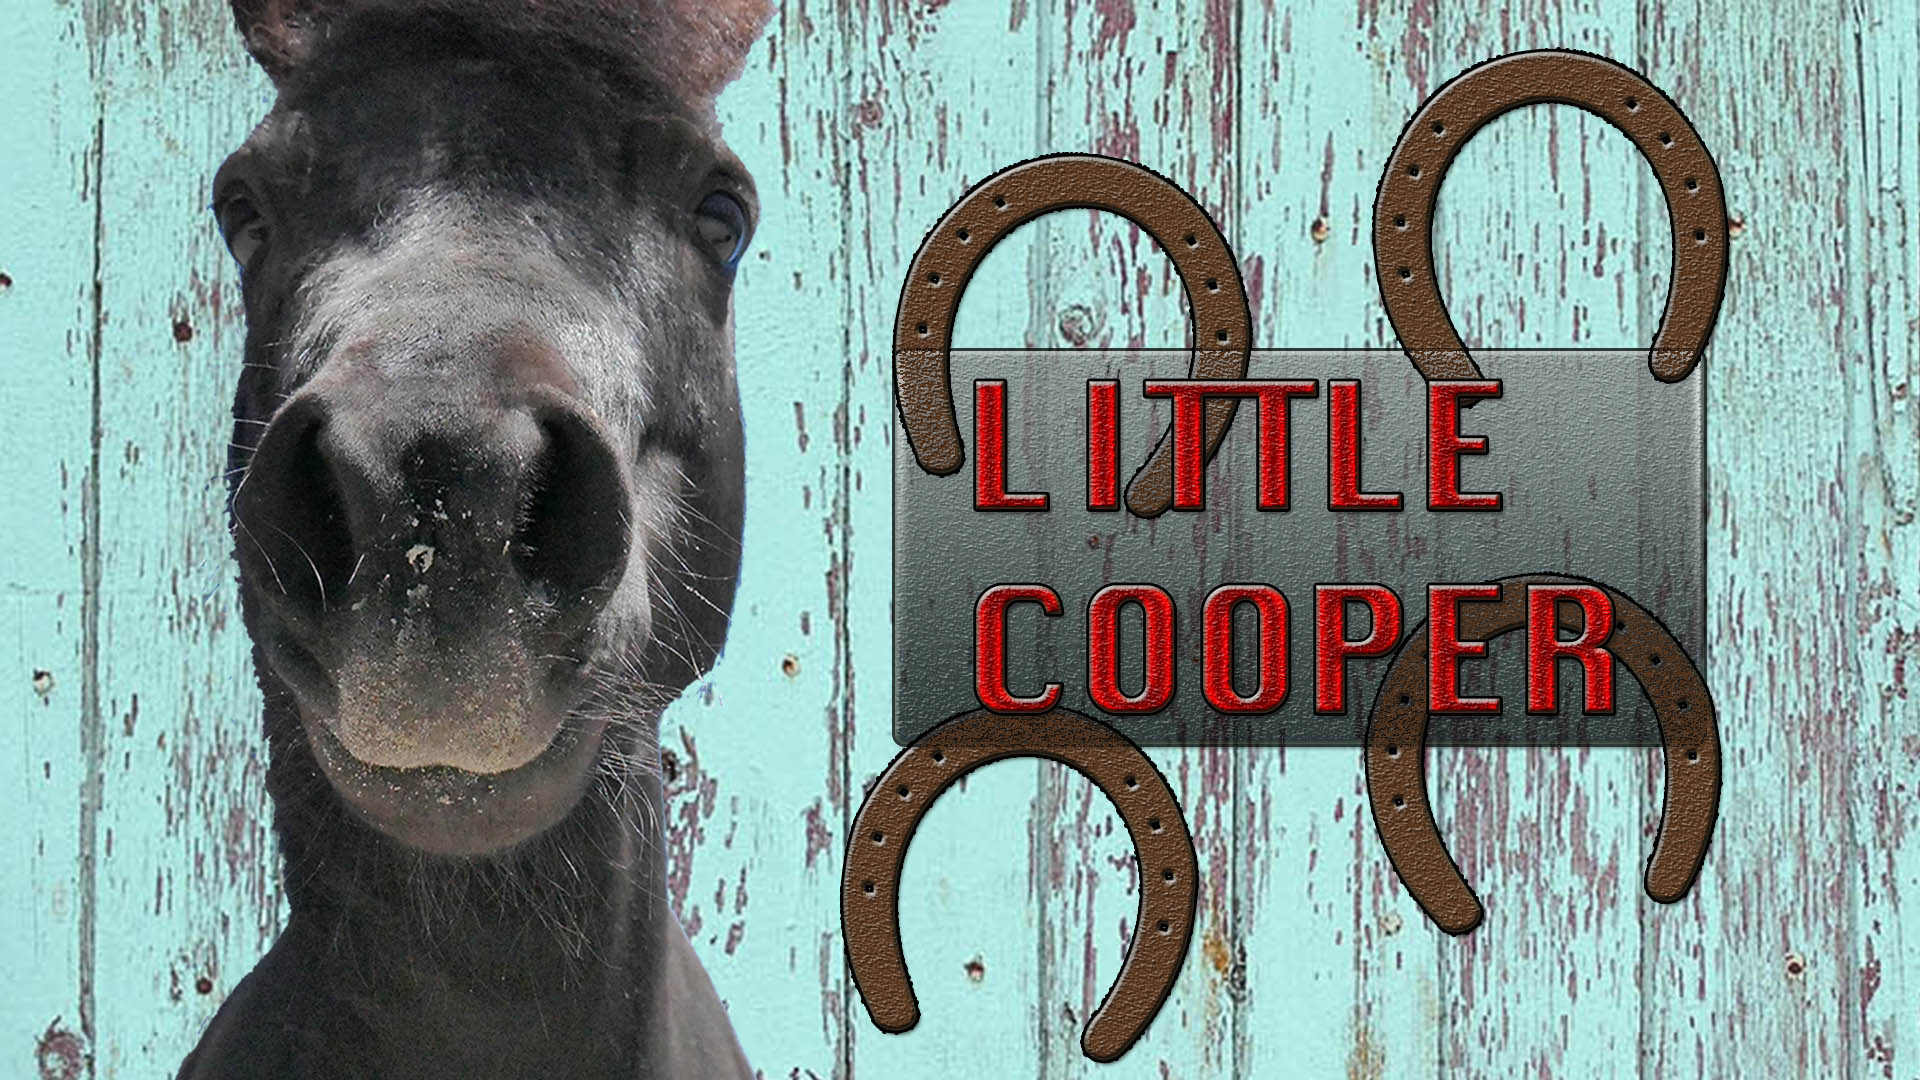 Little Cooper